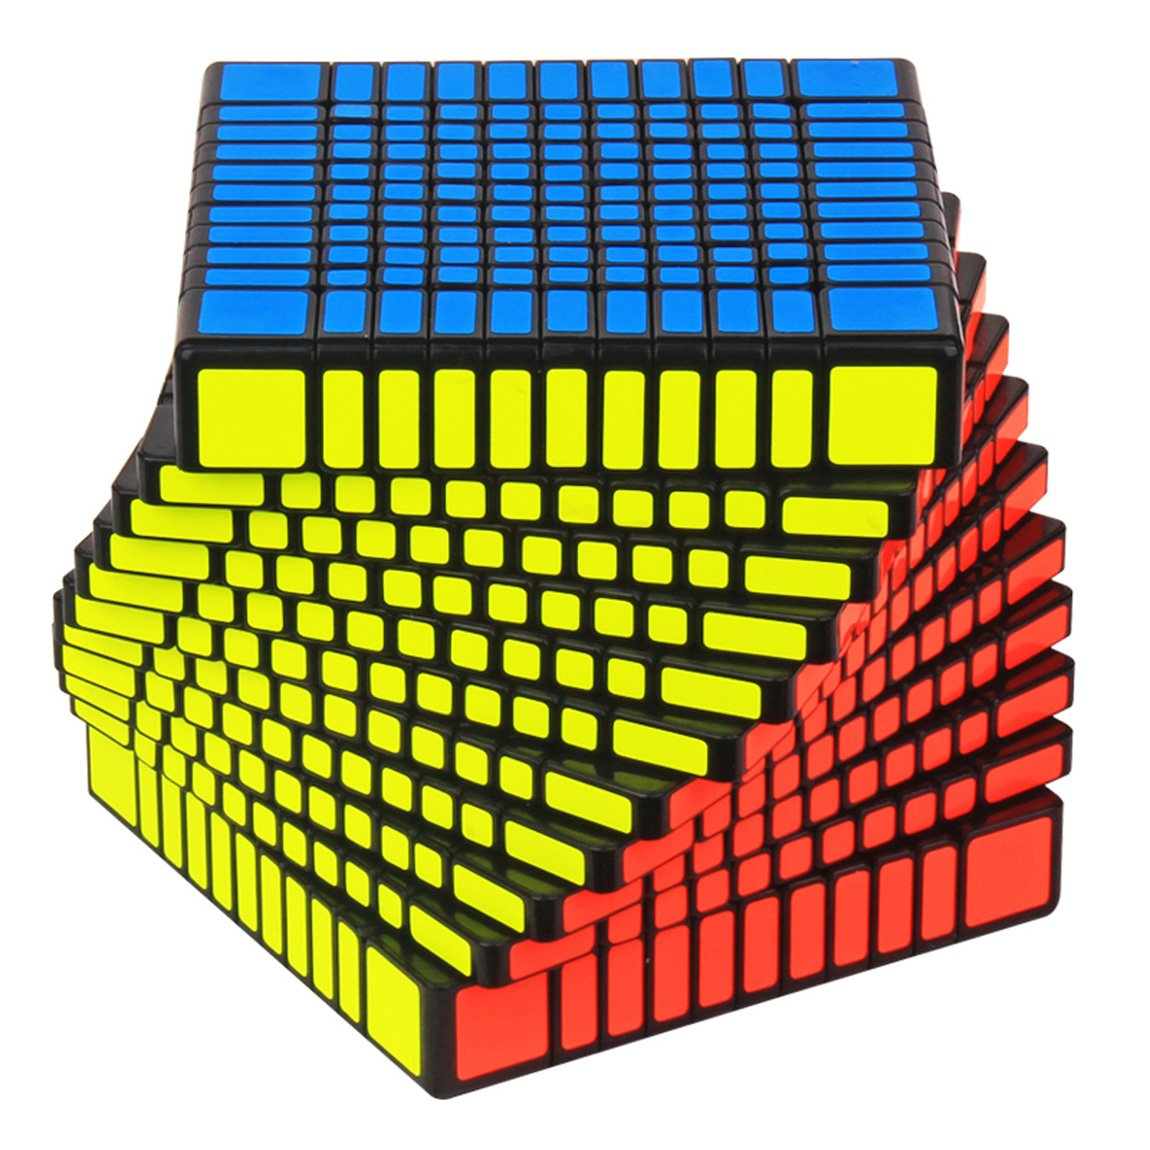 acdiac 7x7x7 to 11x11x11 Pro Speed cube stickerless Magic Cube toy Puzzles toy (11X11X11, BLACK)